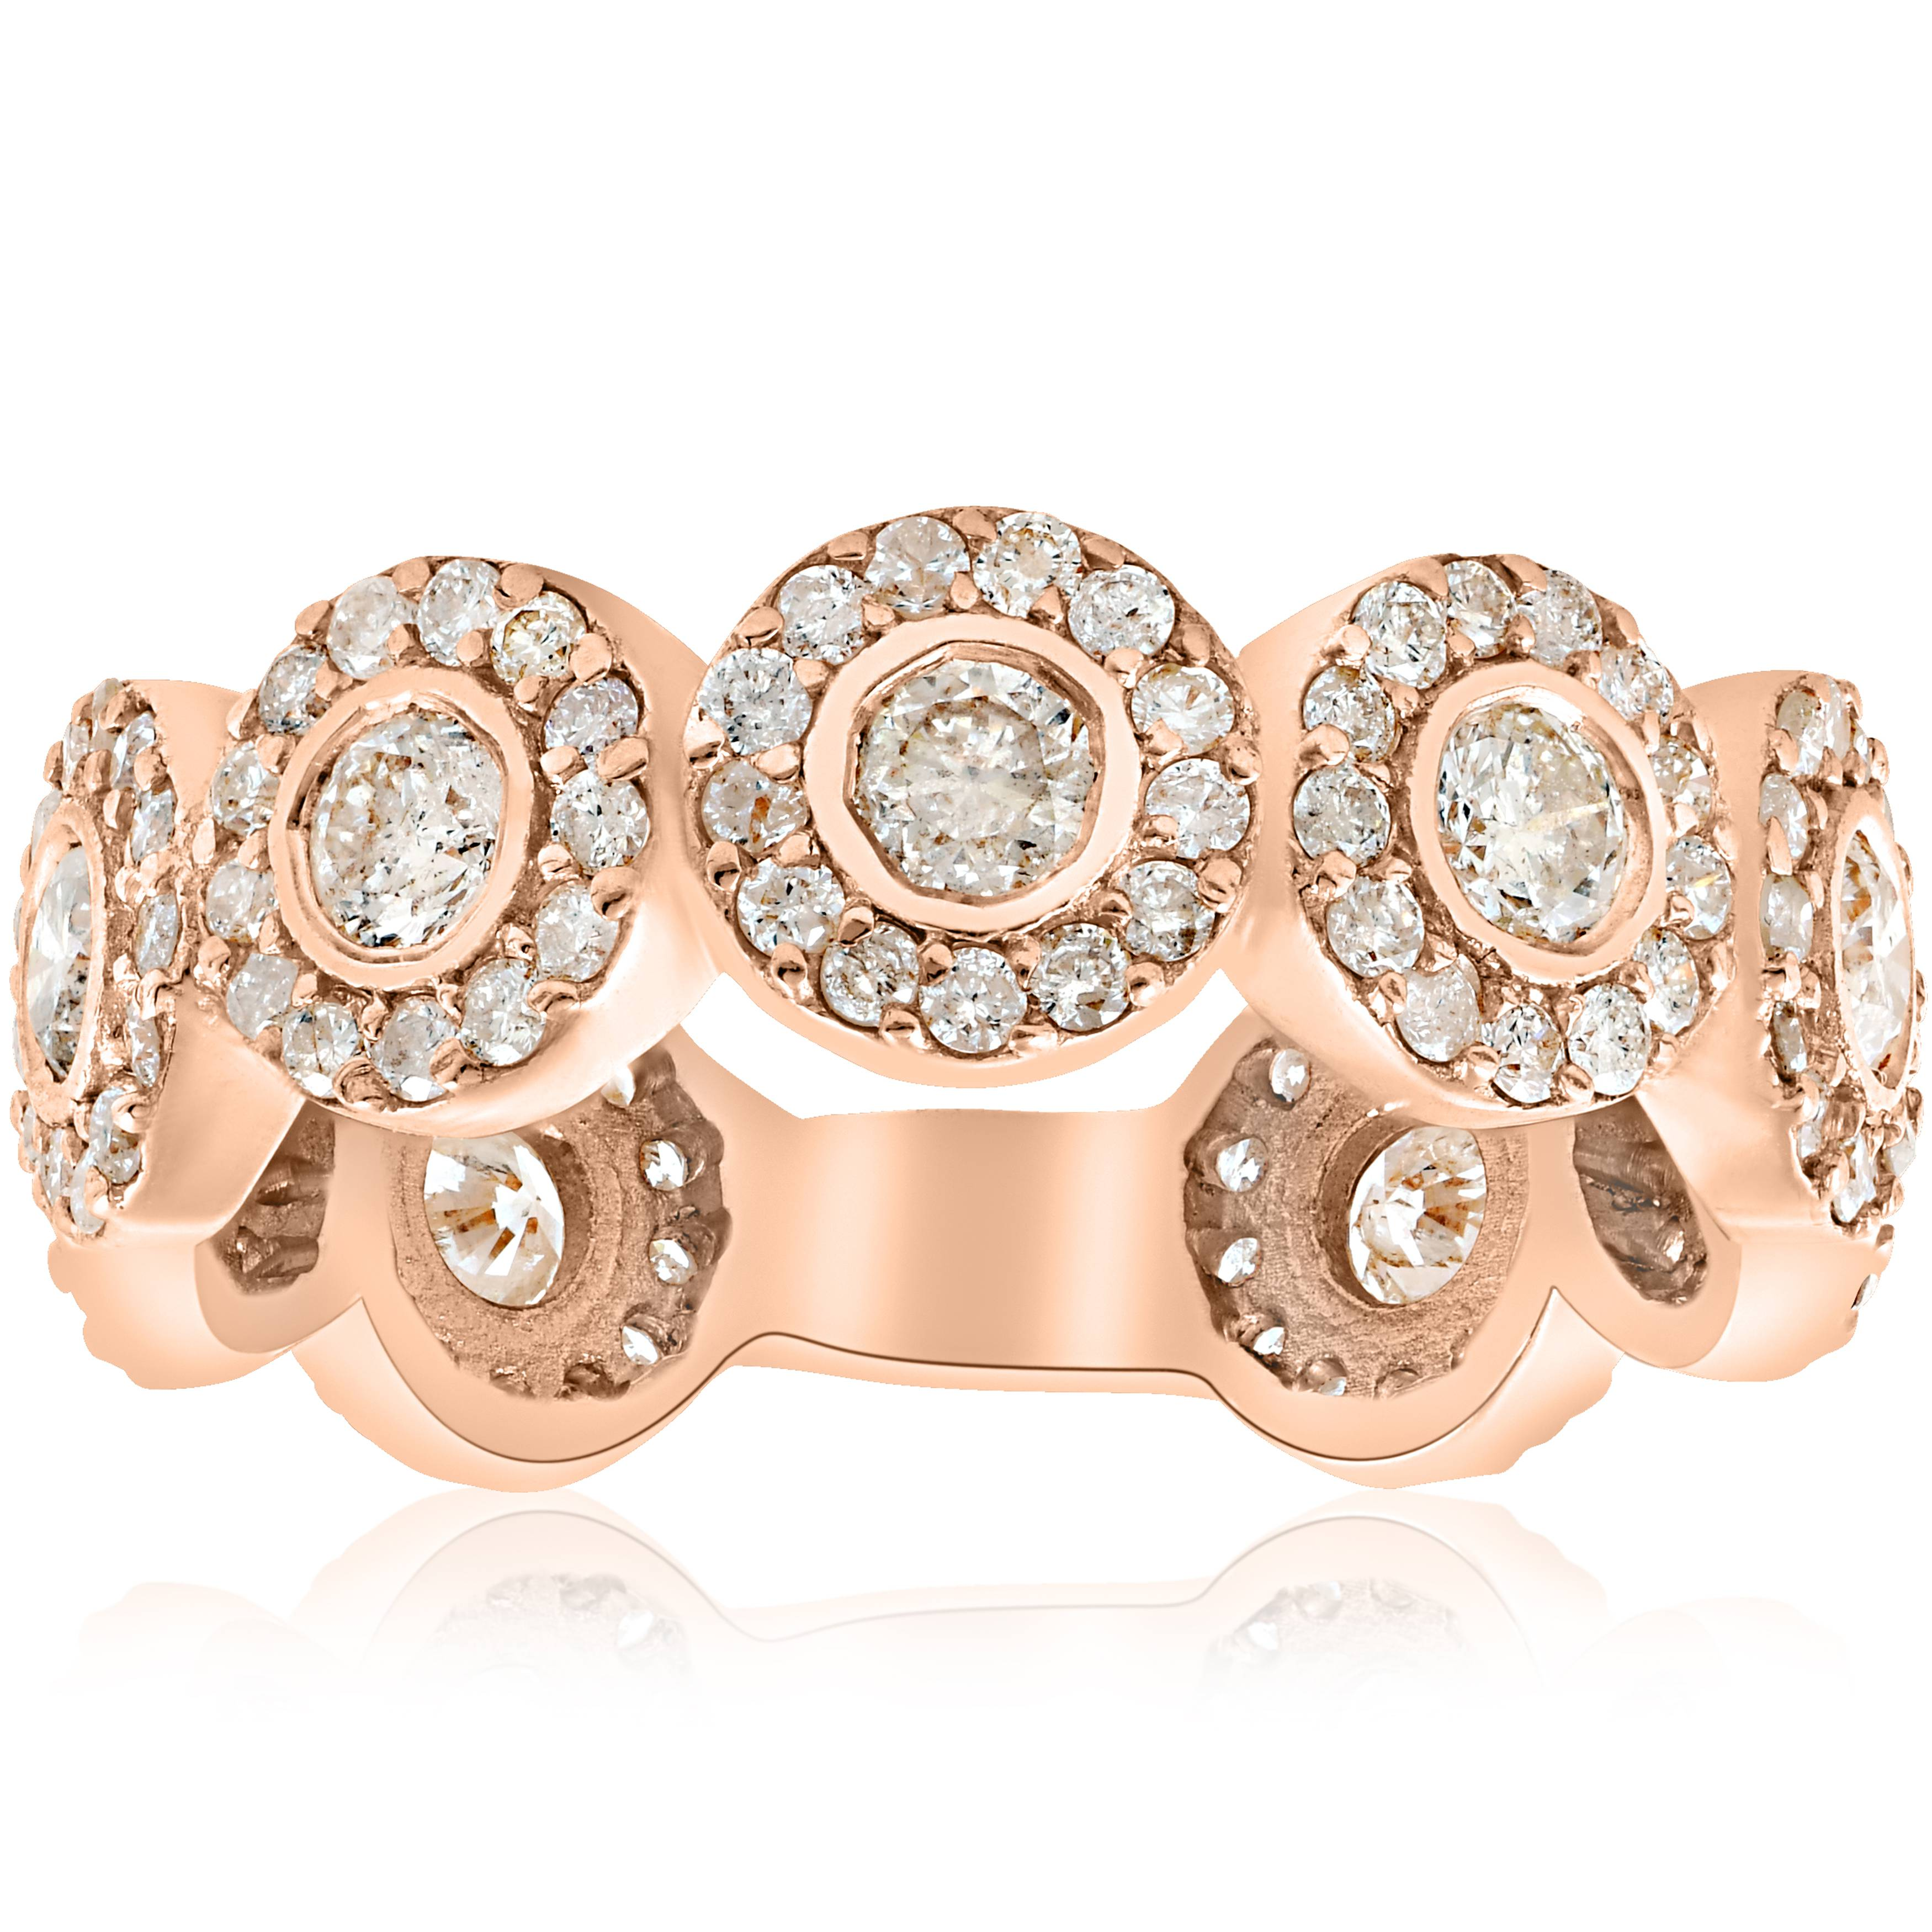 Halo rose gold diamond engagement ring bezel - 2 1 3ct Round Diamond Engagement Ring Bezel Halo 14k Rose Gold Eternity Ring